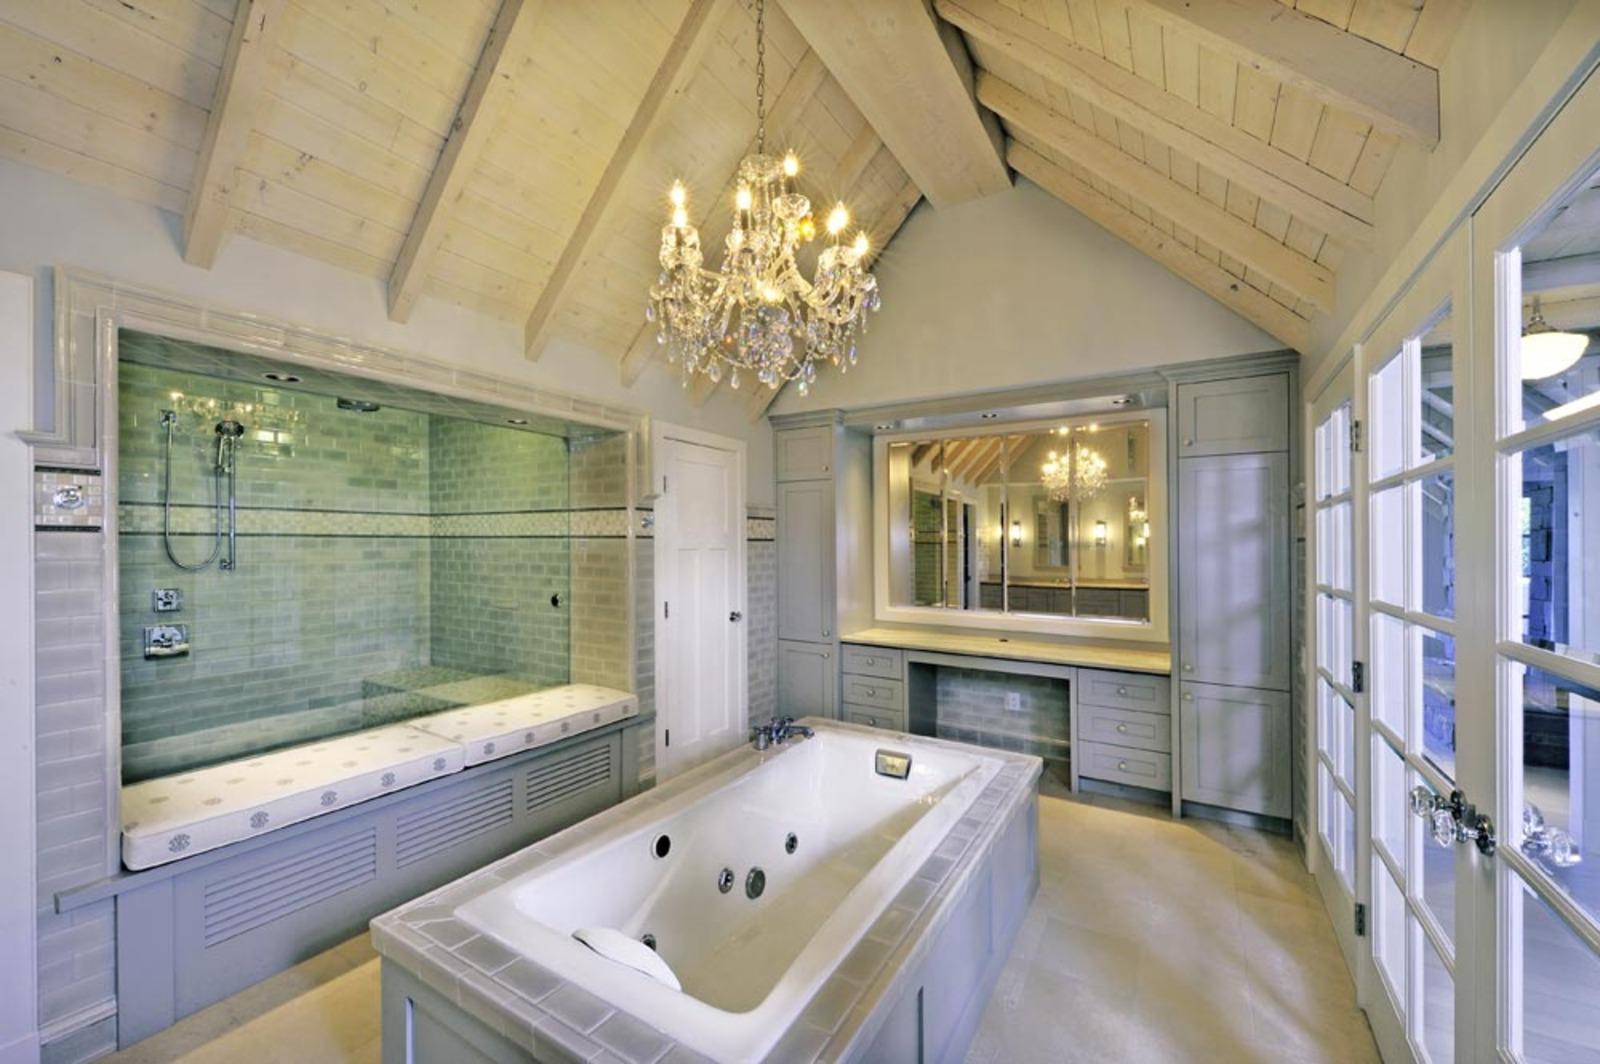 D cor de provence a unique and beautiful lake house - Lake house bathroom ideas ...